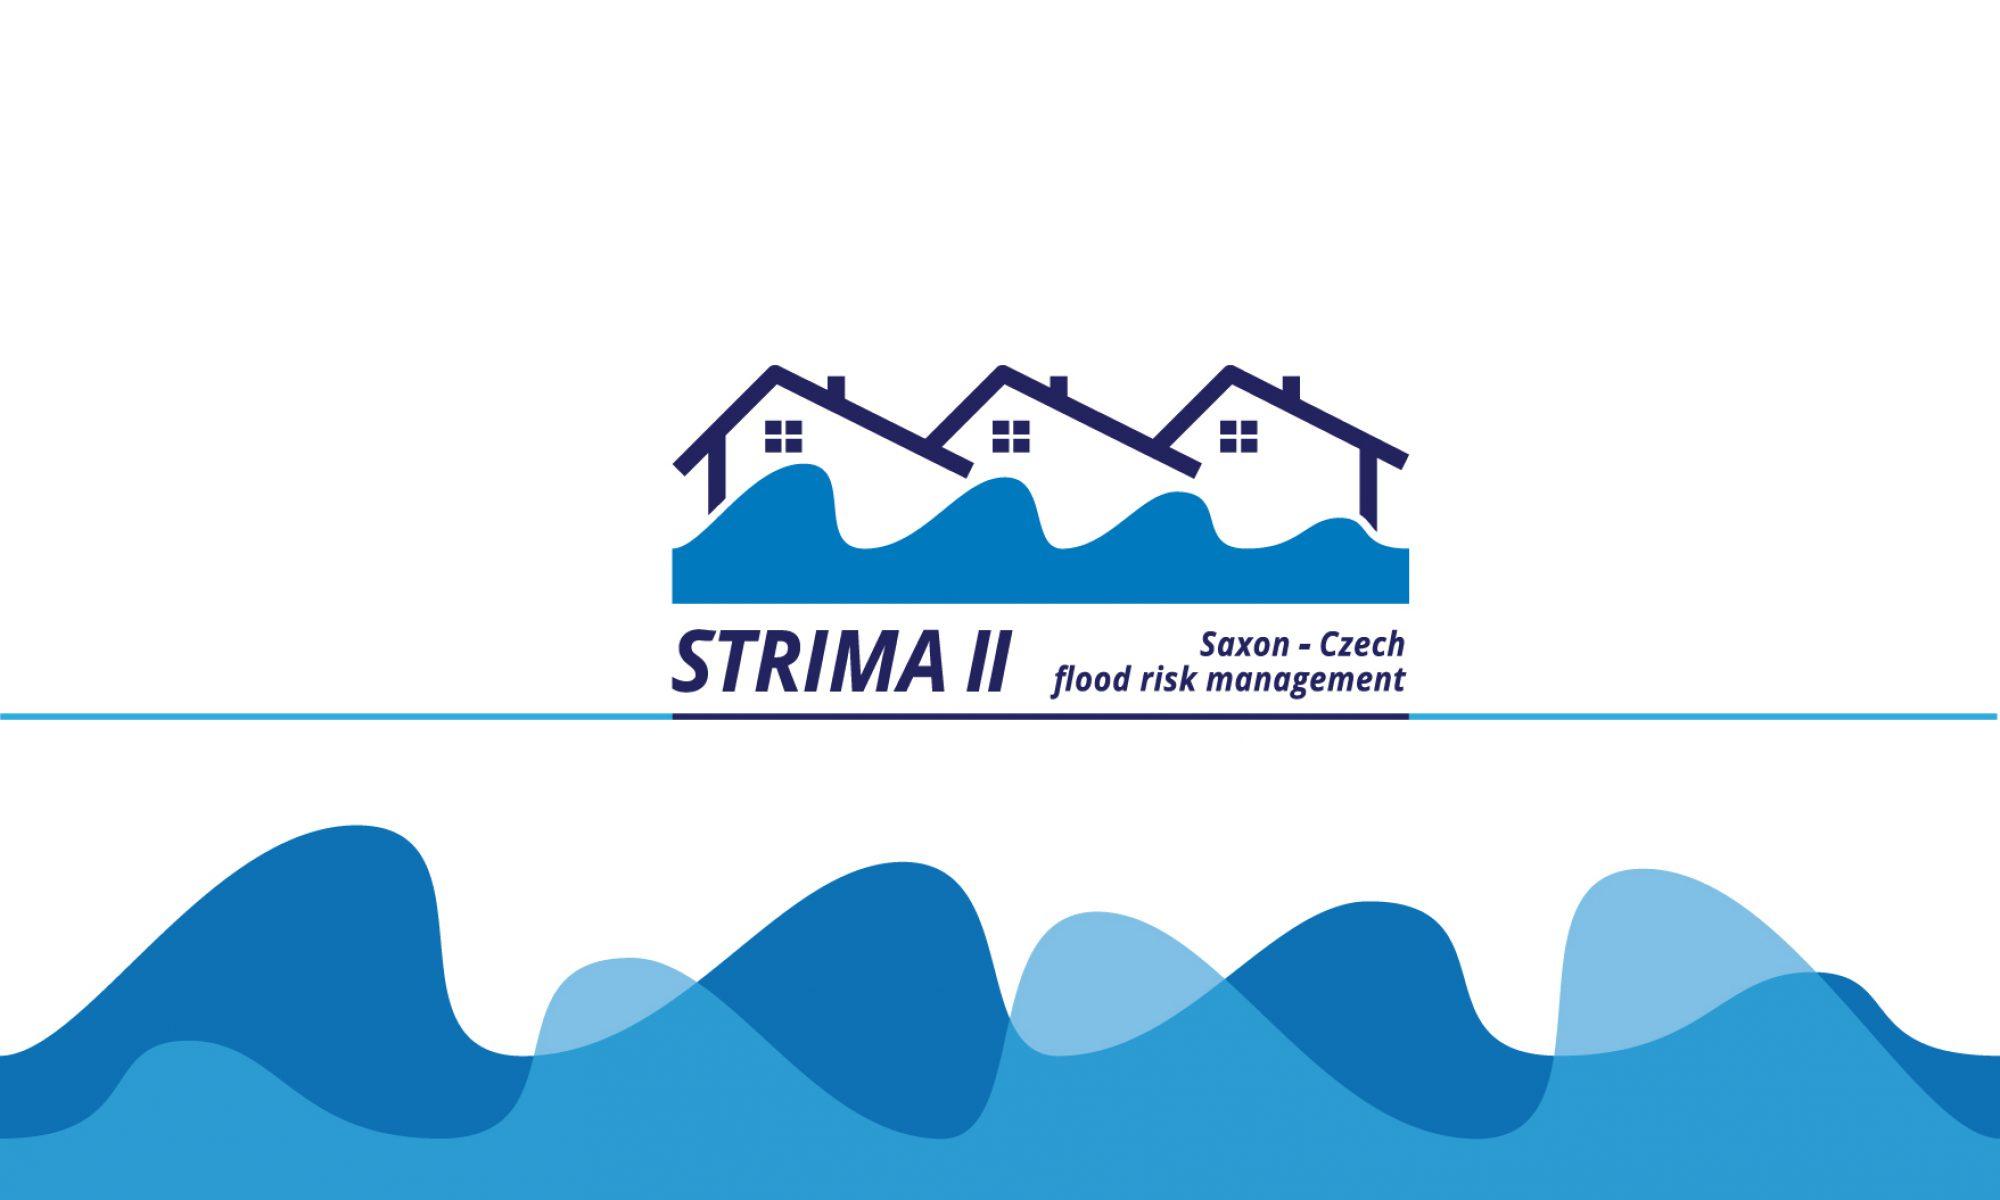 STRIMA II